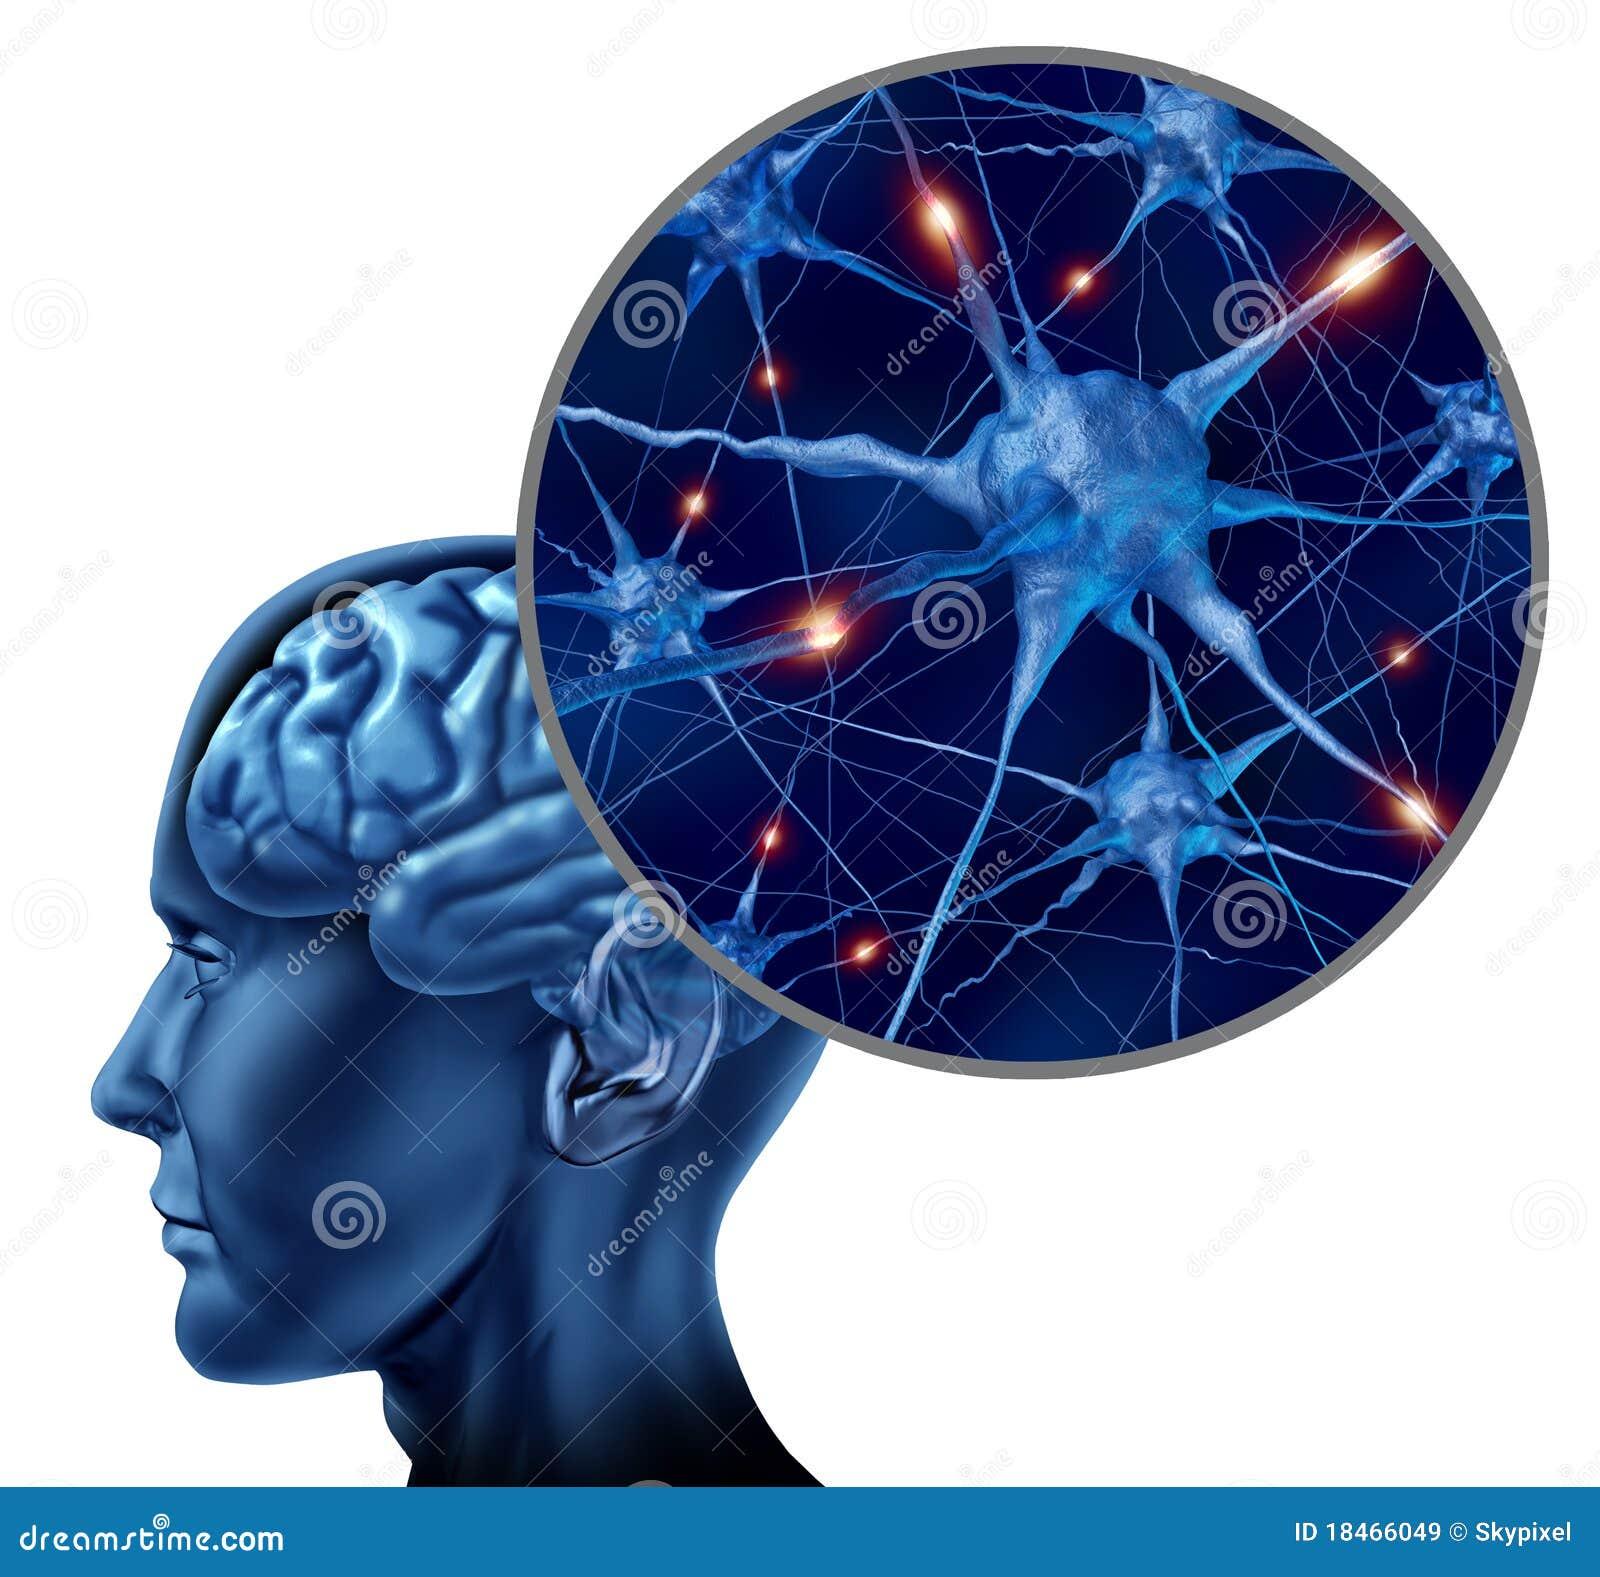 Essays active powers human mind